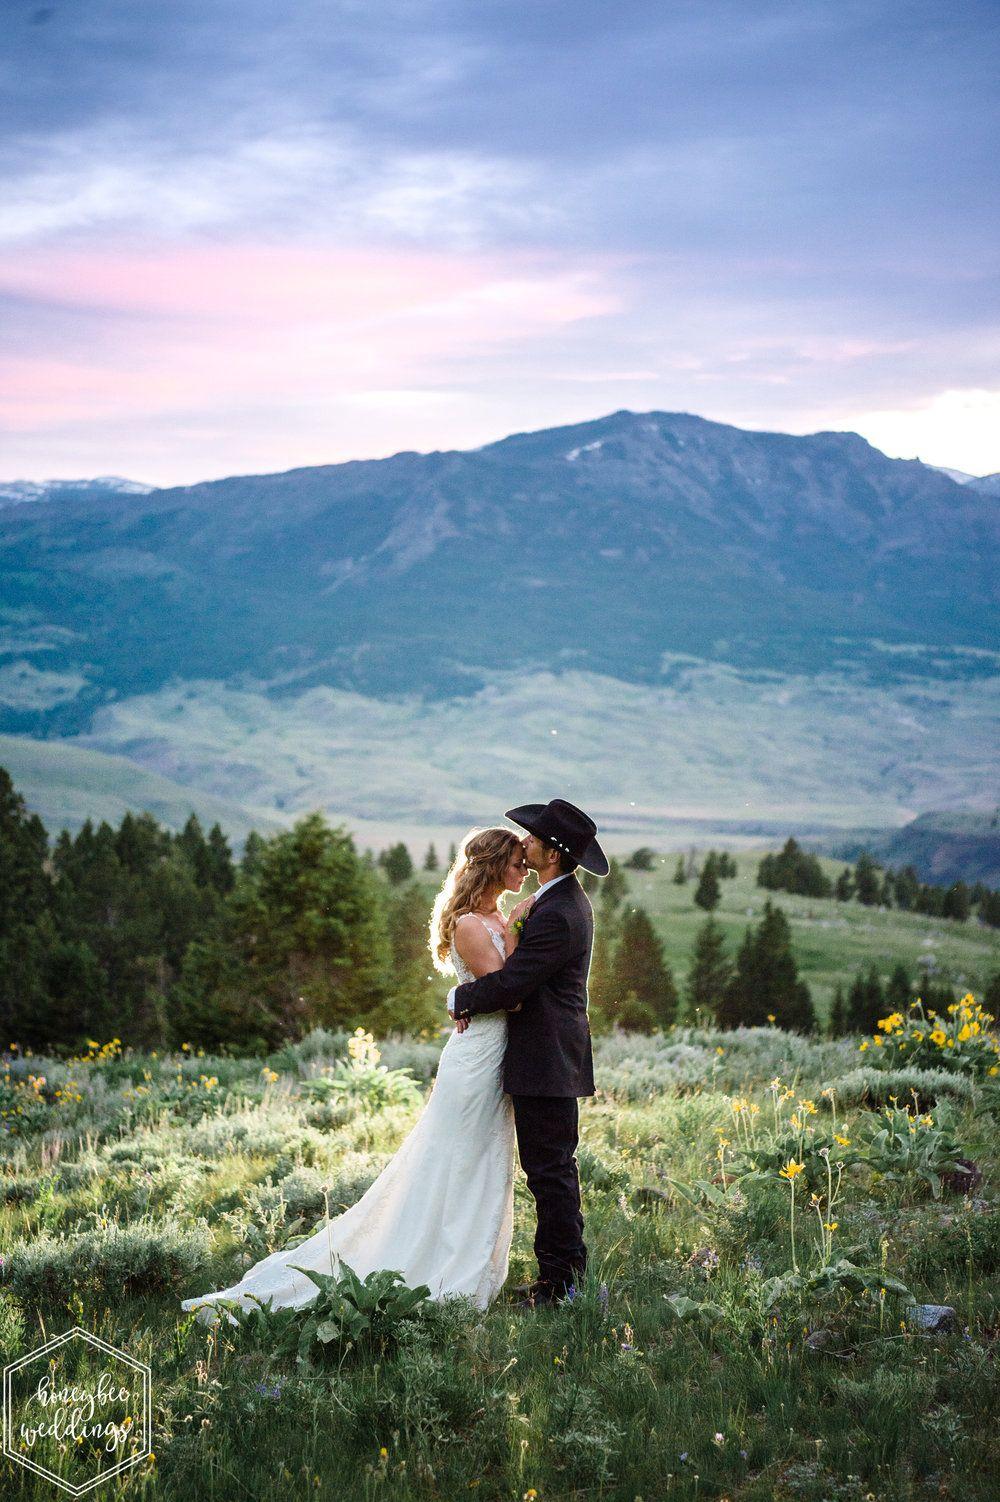 Yellowstone National Park Wedding National Park Wedding Mountain Wedding Photos Park Weddings